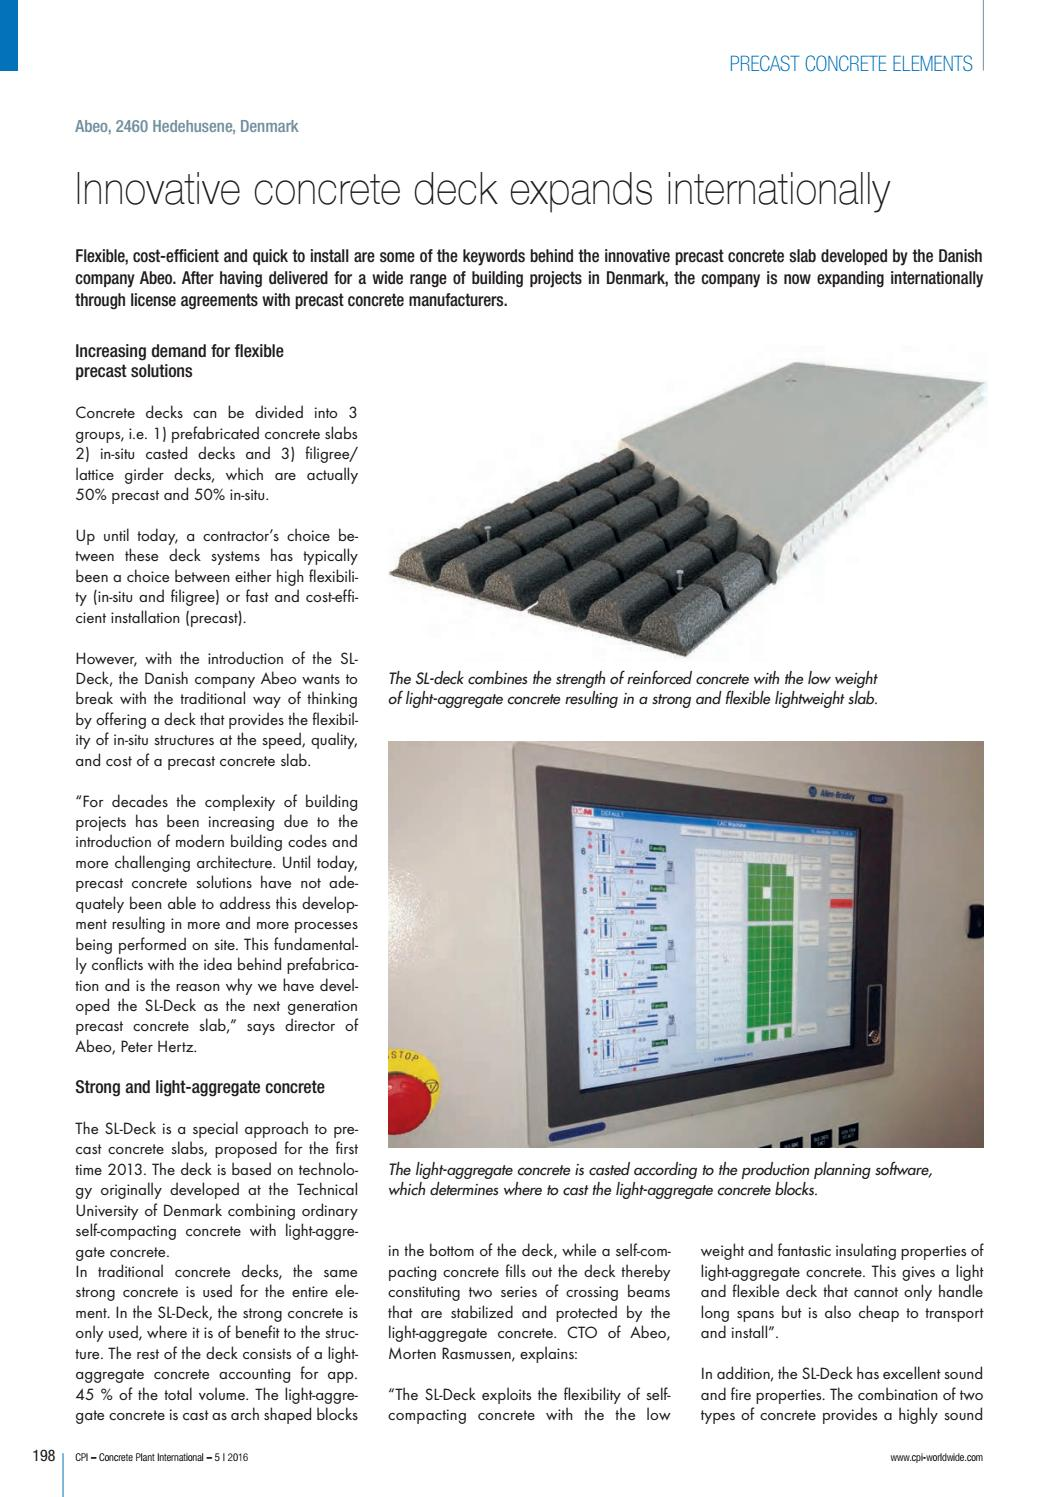 Innovative concrete deck expands internationally (english version)